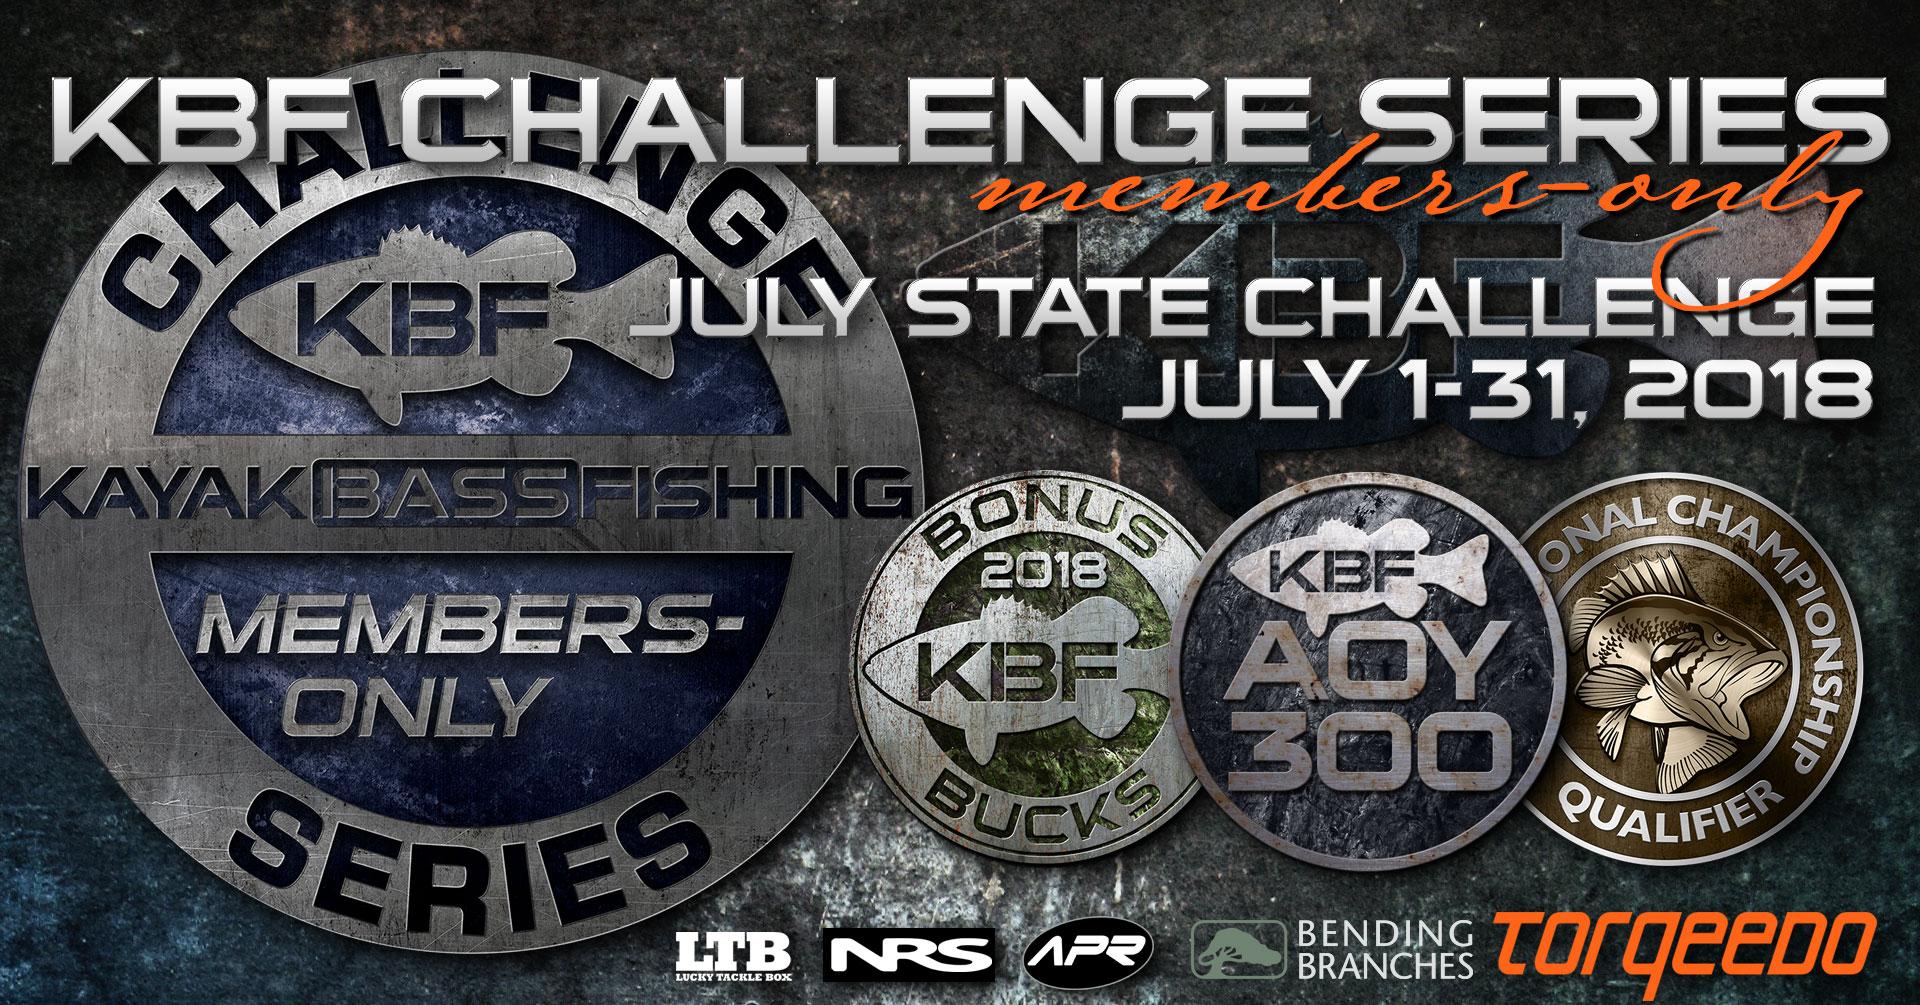 July 2018 KBF State Challenge